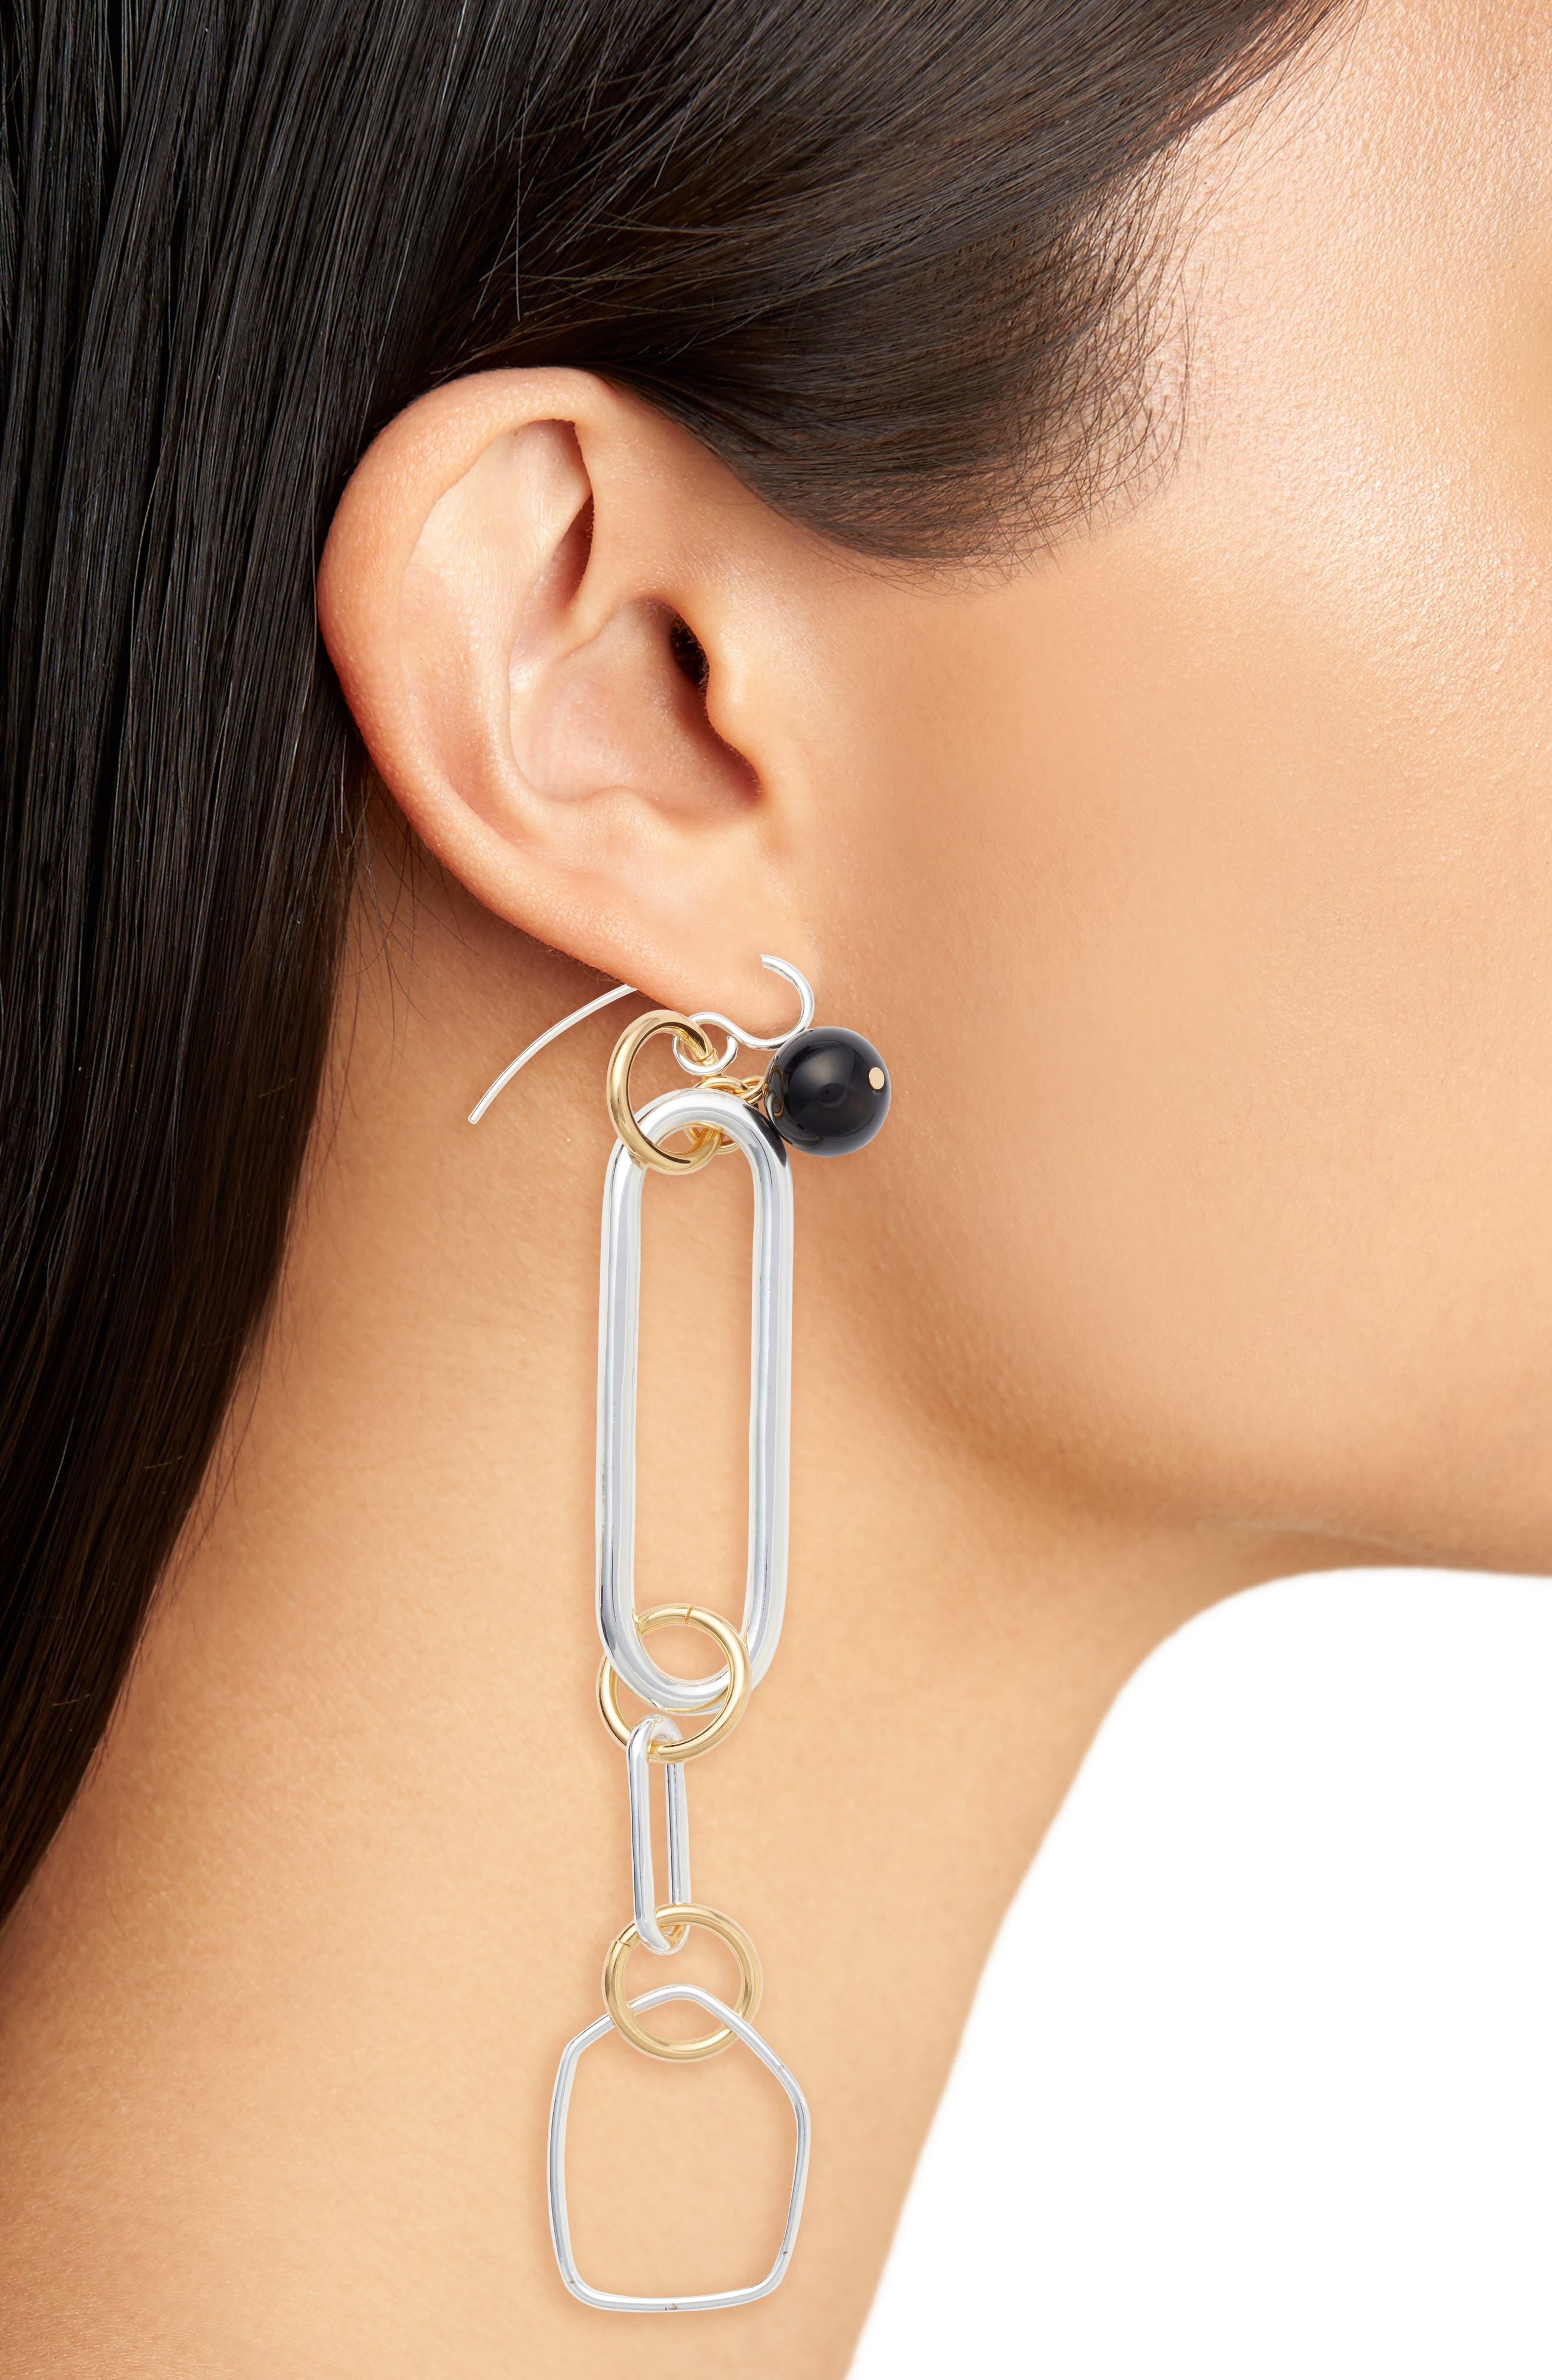 Asymmetrical Drop Earrings,                             Alternate thumbnail 2, color,                             Gold/ Silver/ Black